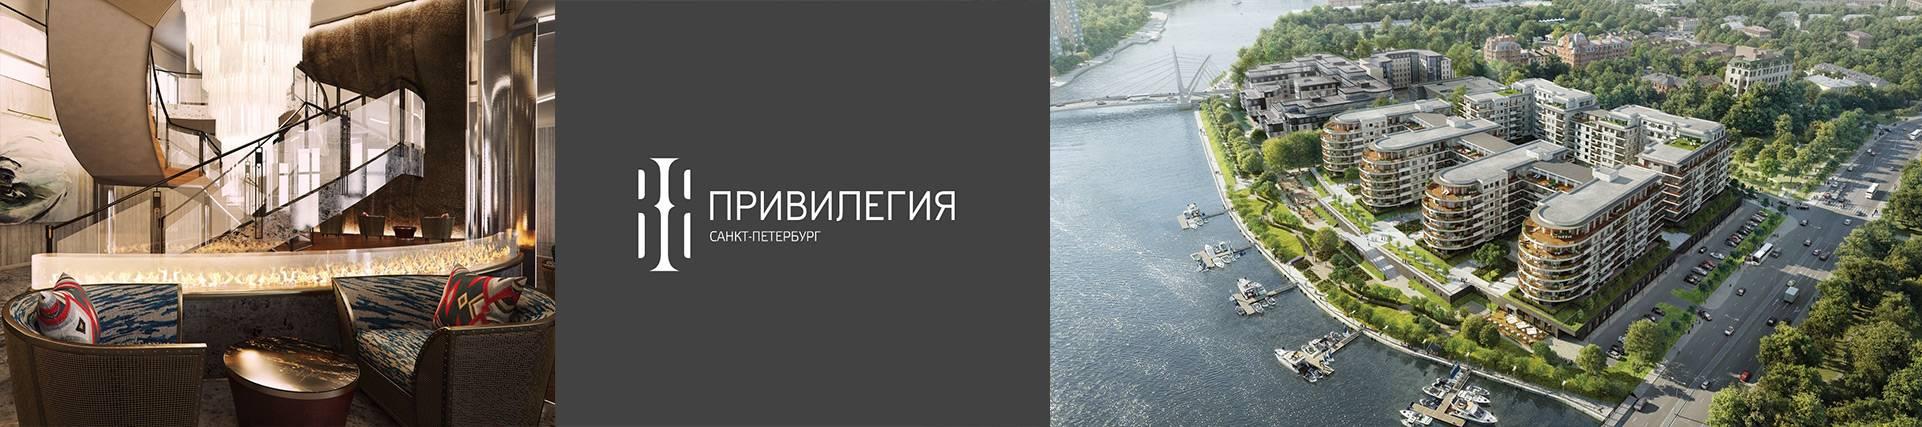 https://evspb.ru/wp-content/uploads/2018/07/priv_banner.jpg